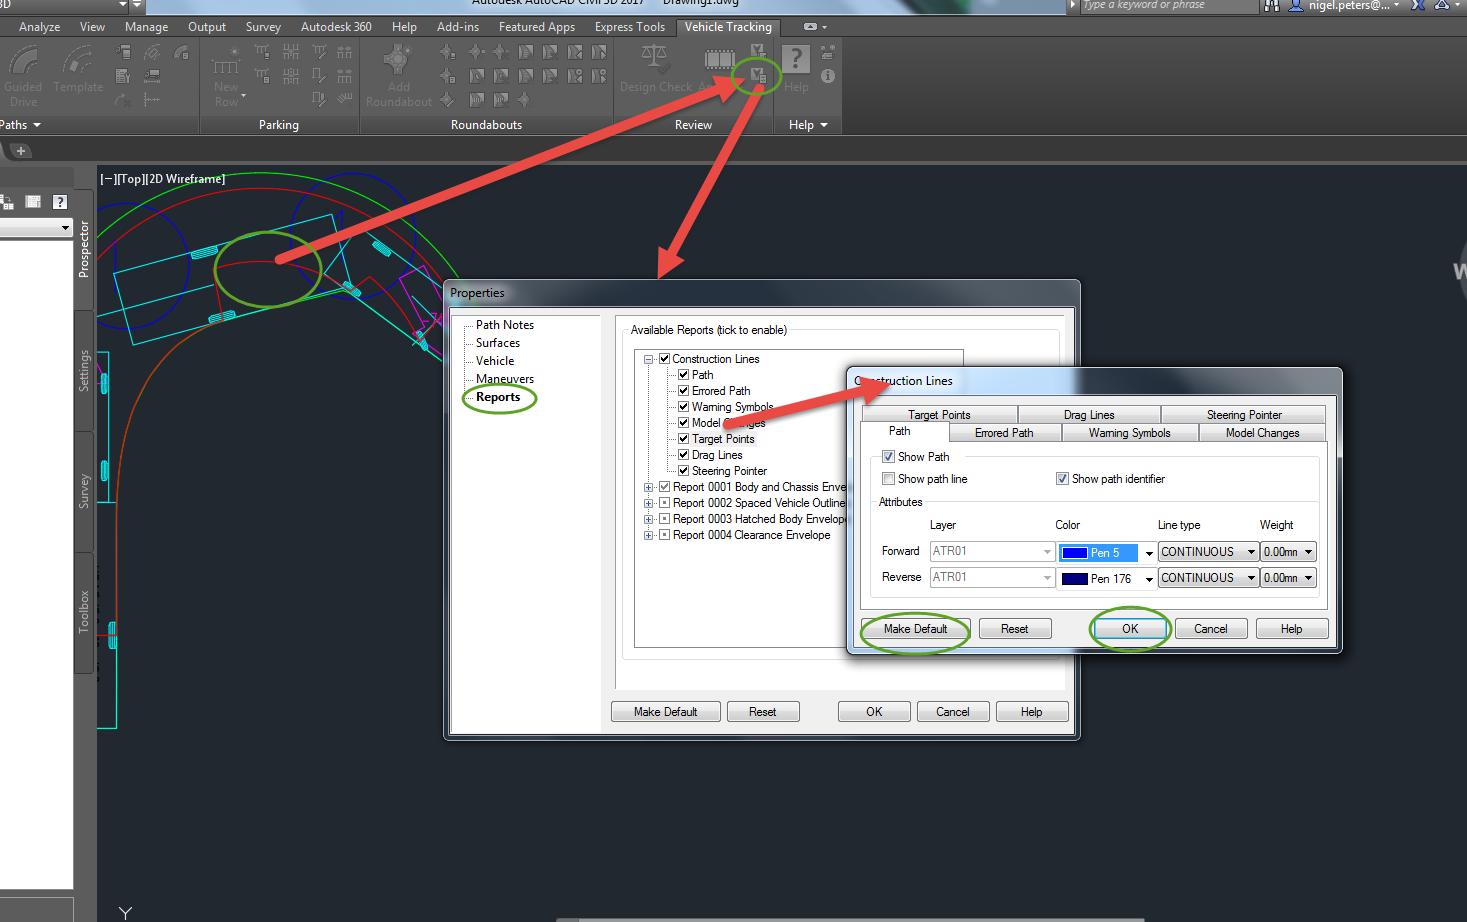 Swept Path: Colors? - Autodesk Community- Vehicle Tracking